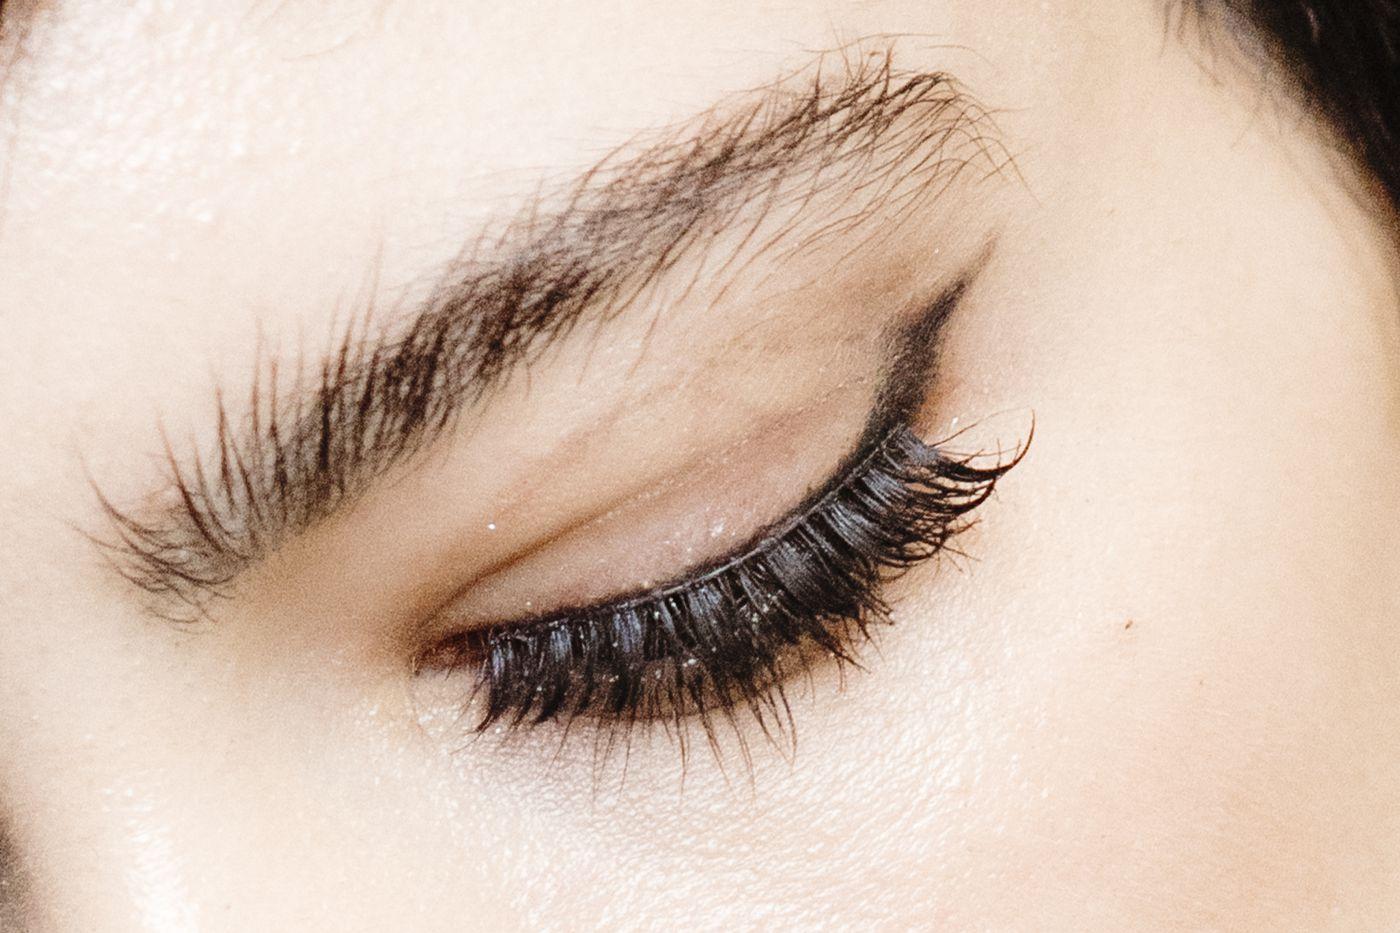 E l f  cosmetics used North Korean materials in false eyelash kits - Vox